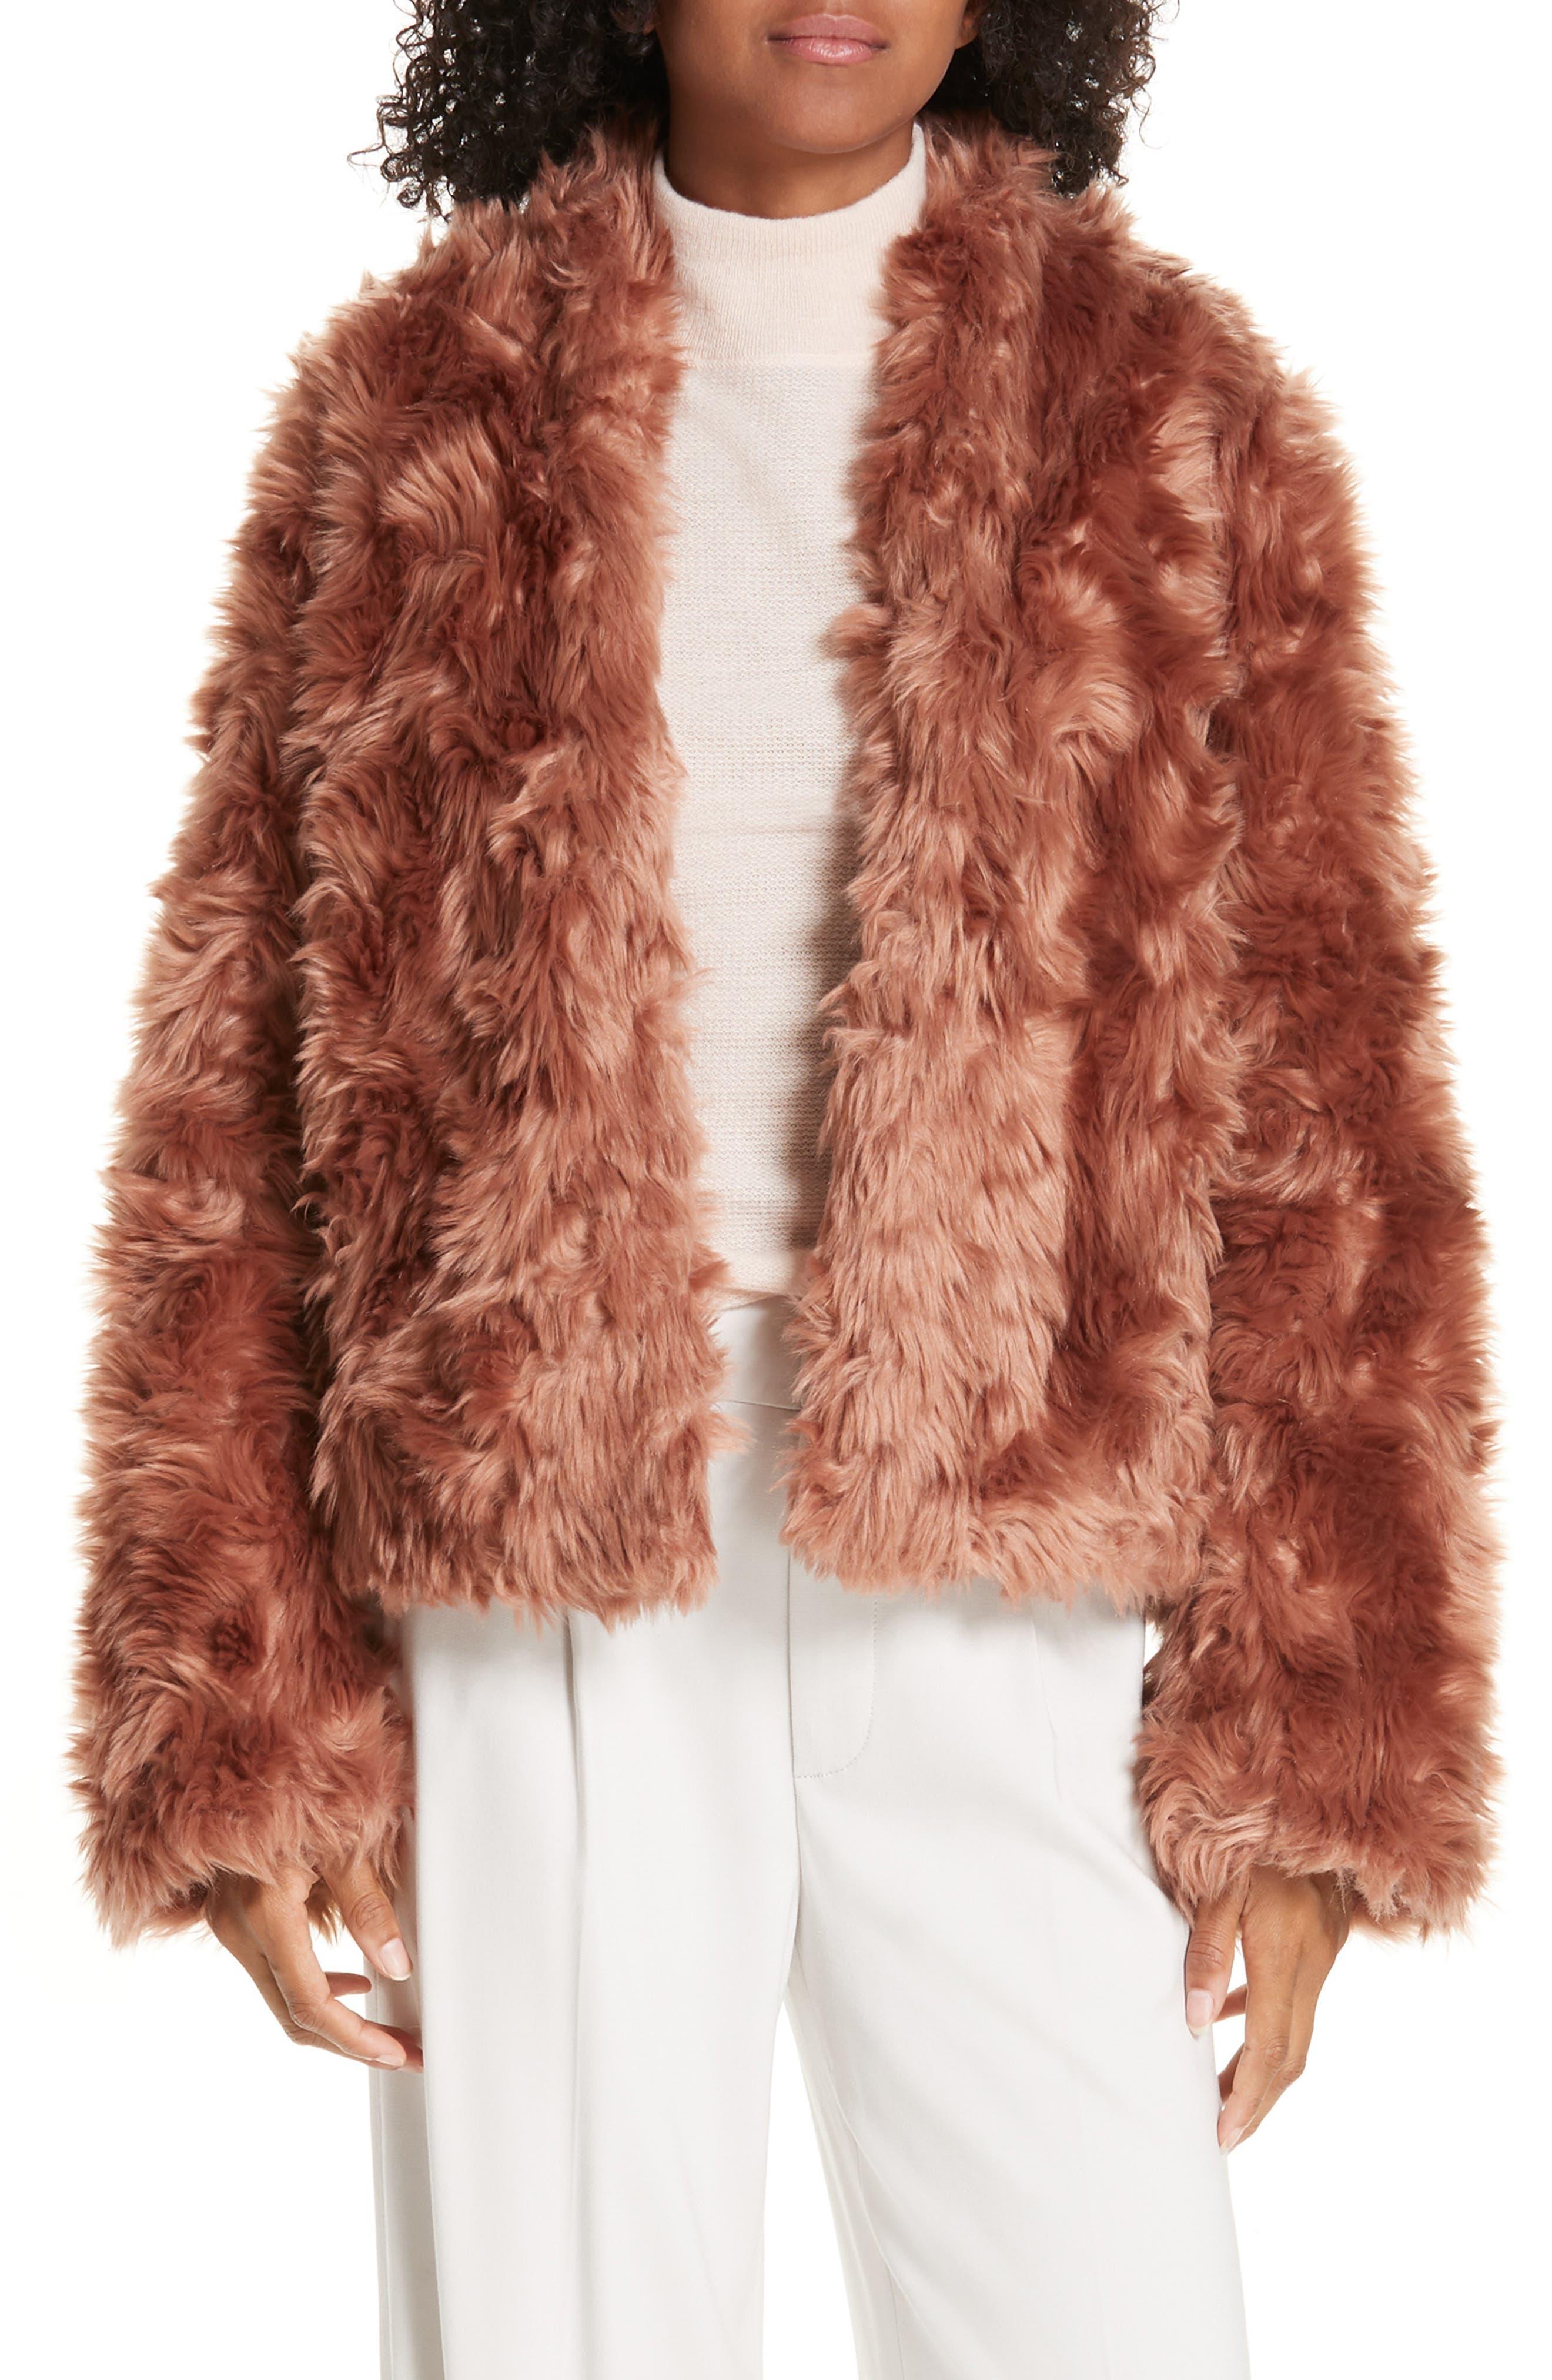 VINCE Plush Faux Fur Jacket, Main, color, PINK UMBER